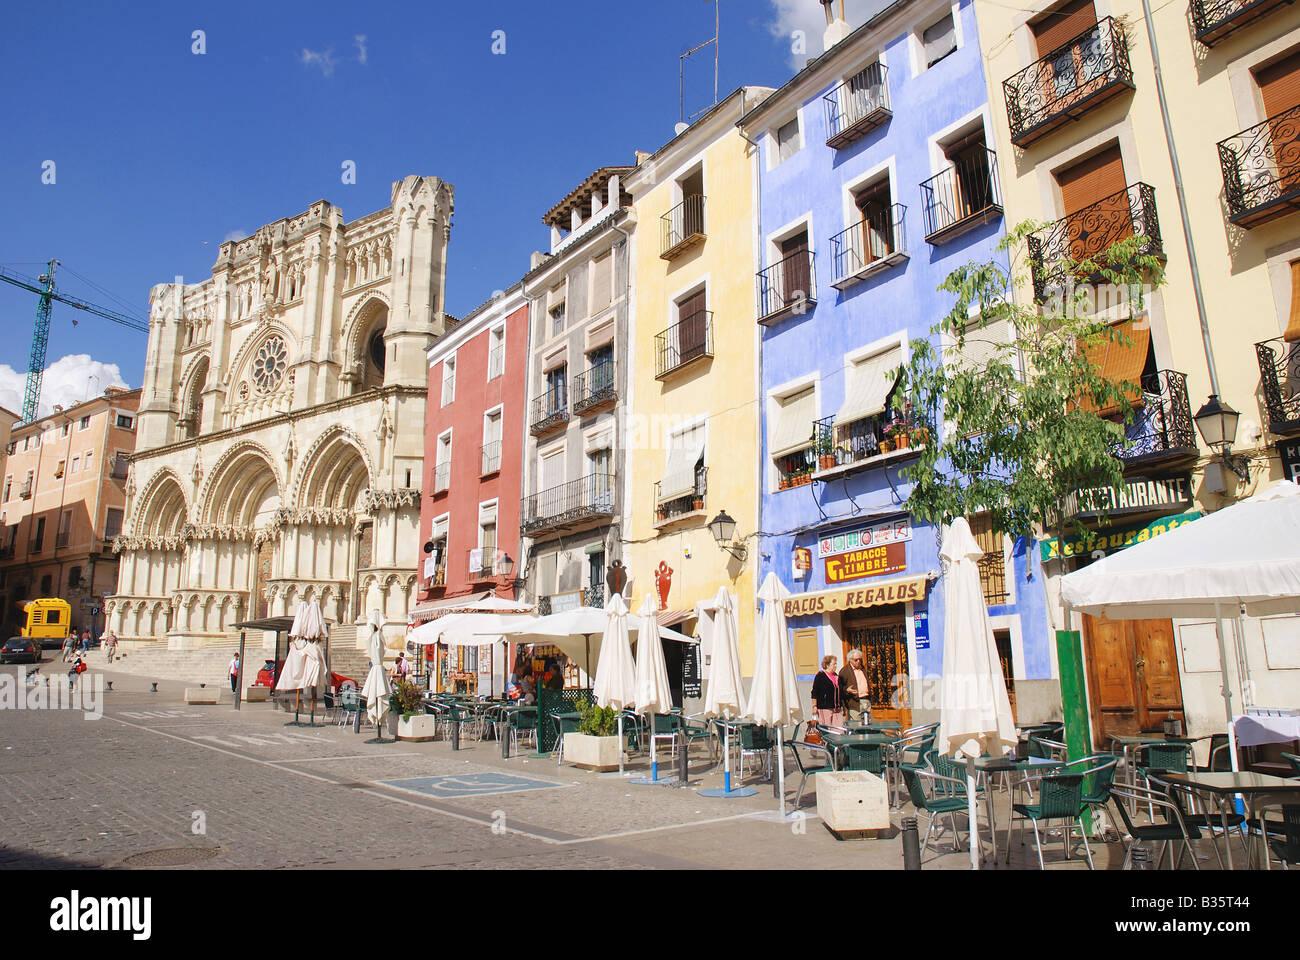 Main Square. Cuenca. Castile La Mancha. Spain. - Stock Image